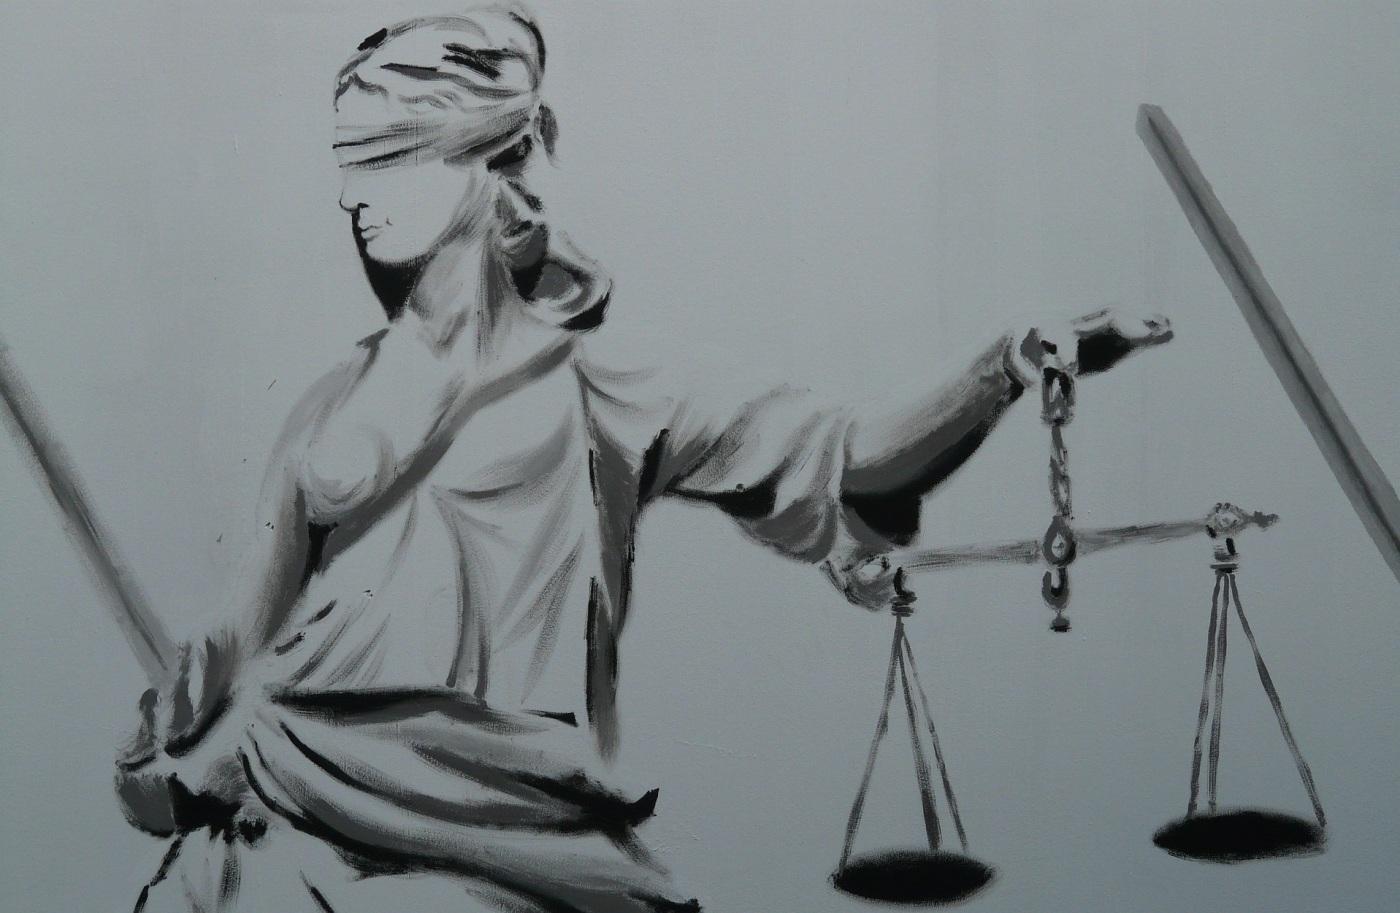 justice-9017_1920